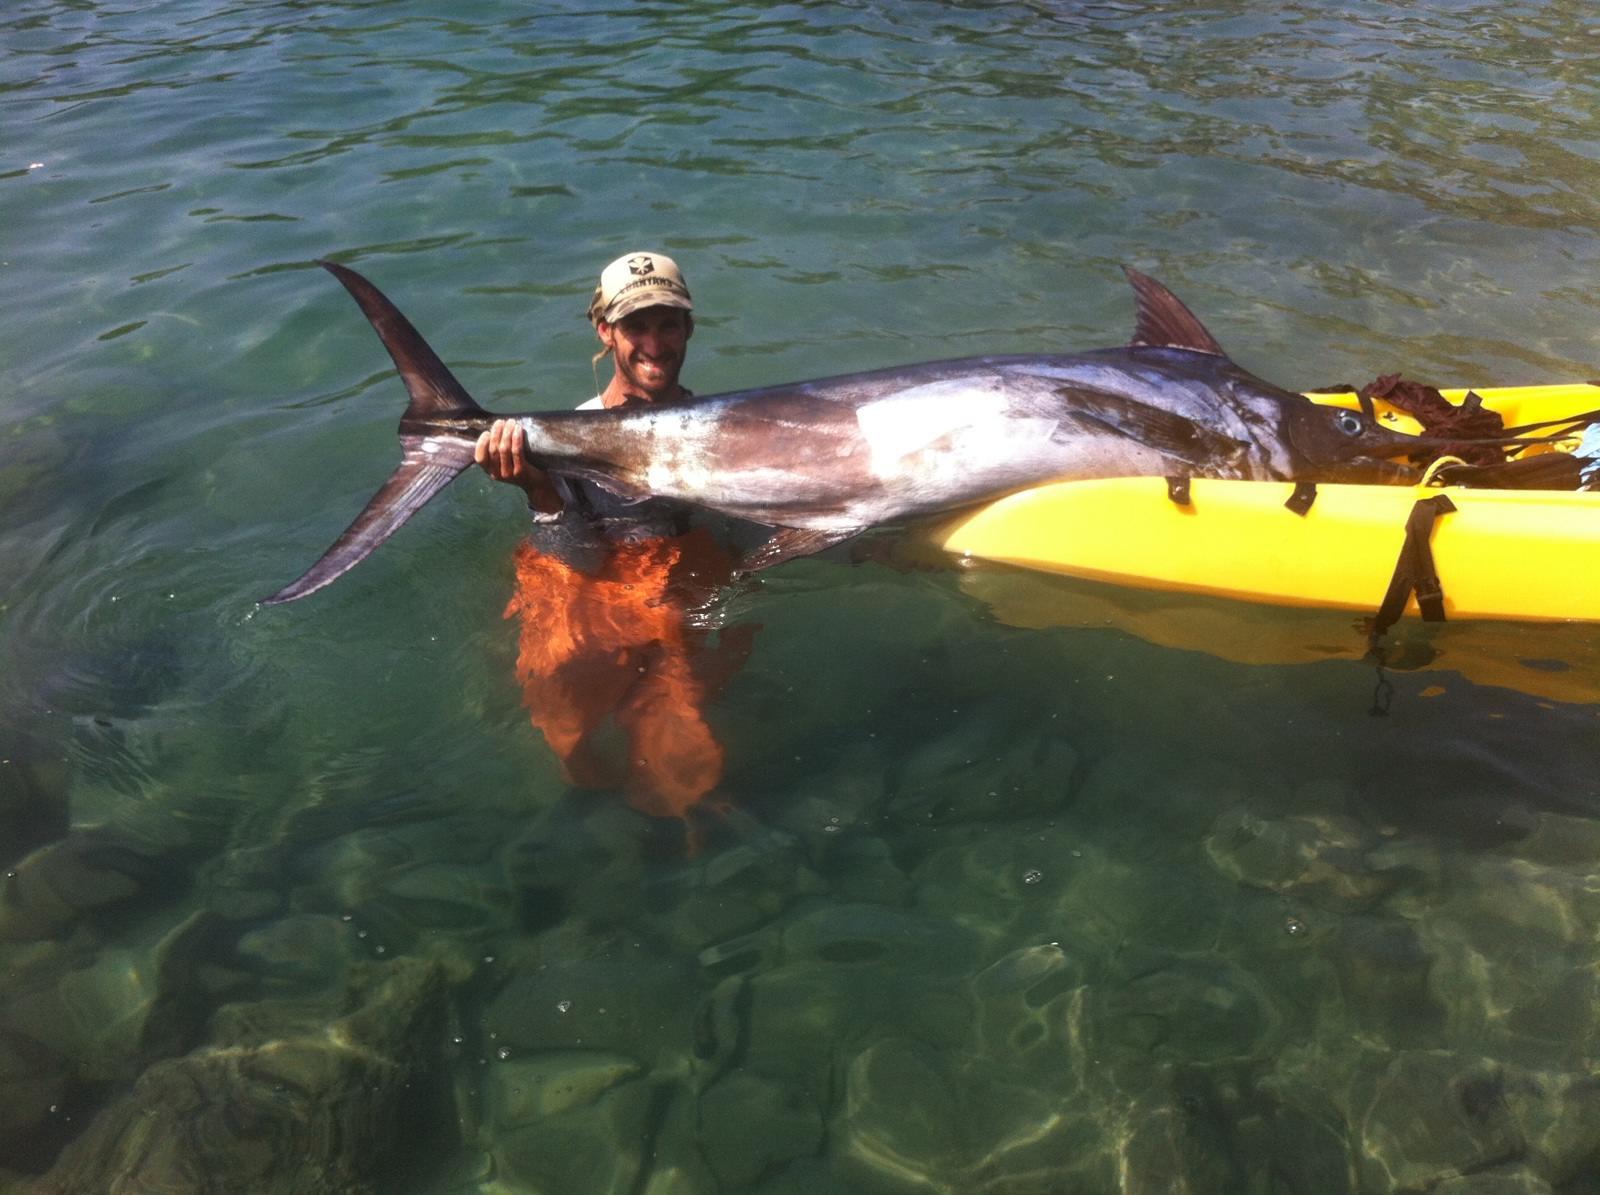 Long kayak fights with billfish